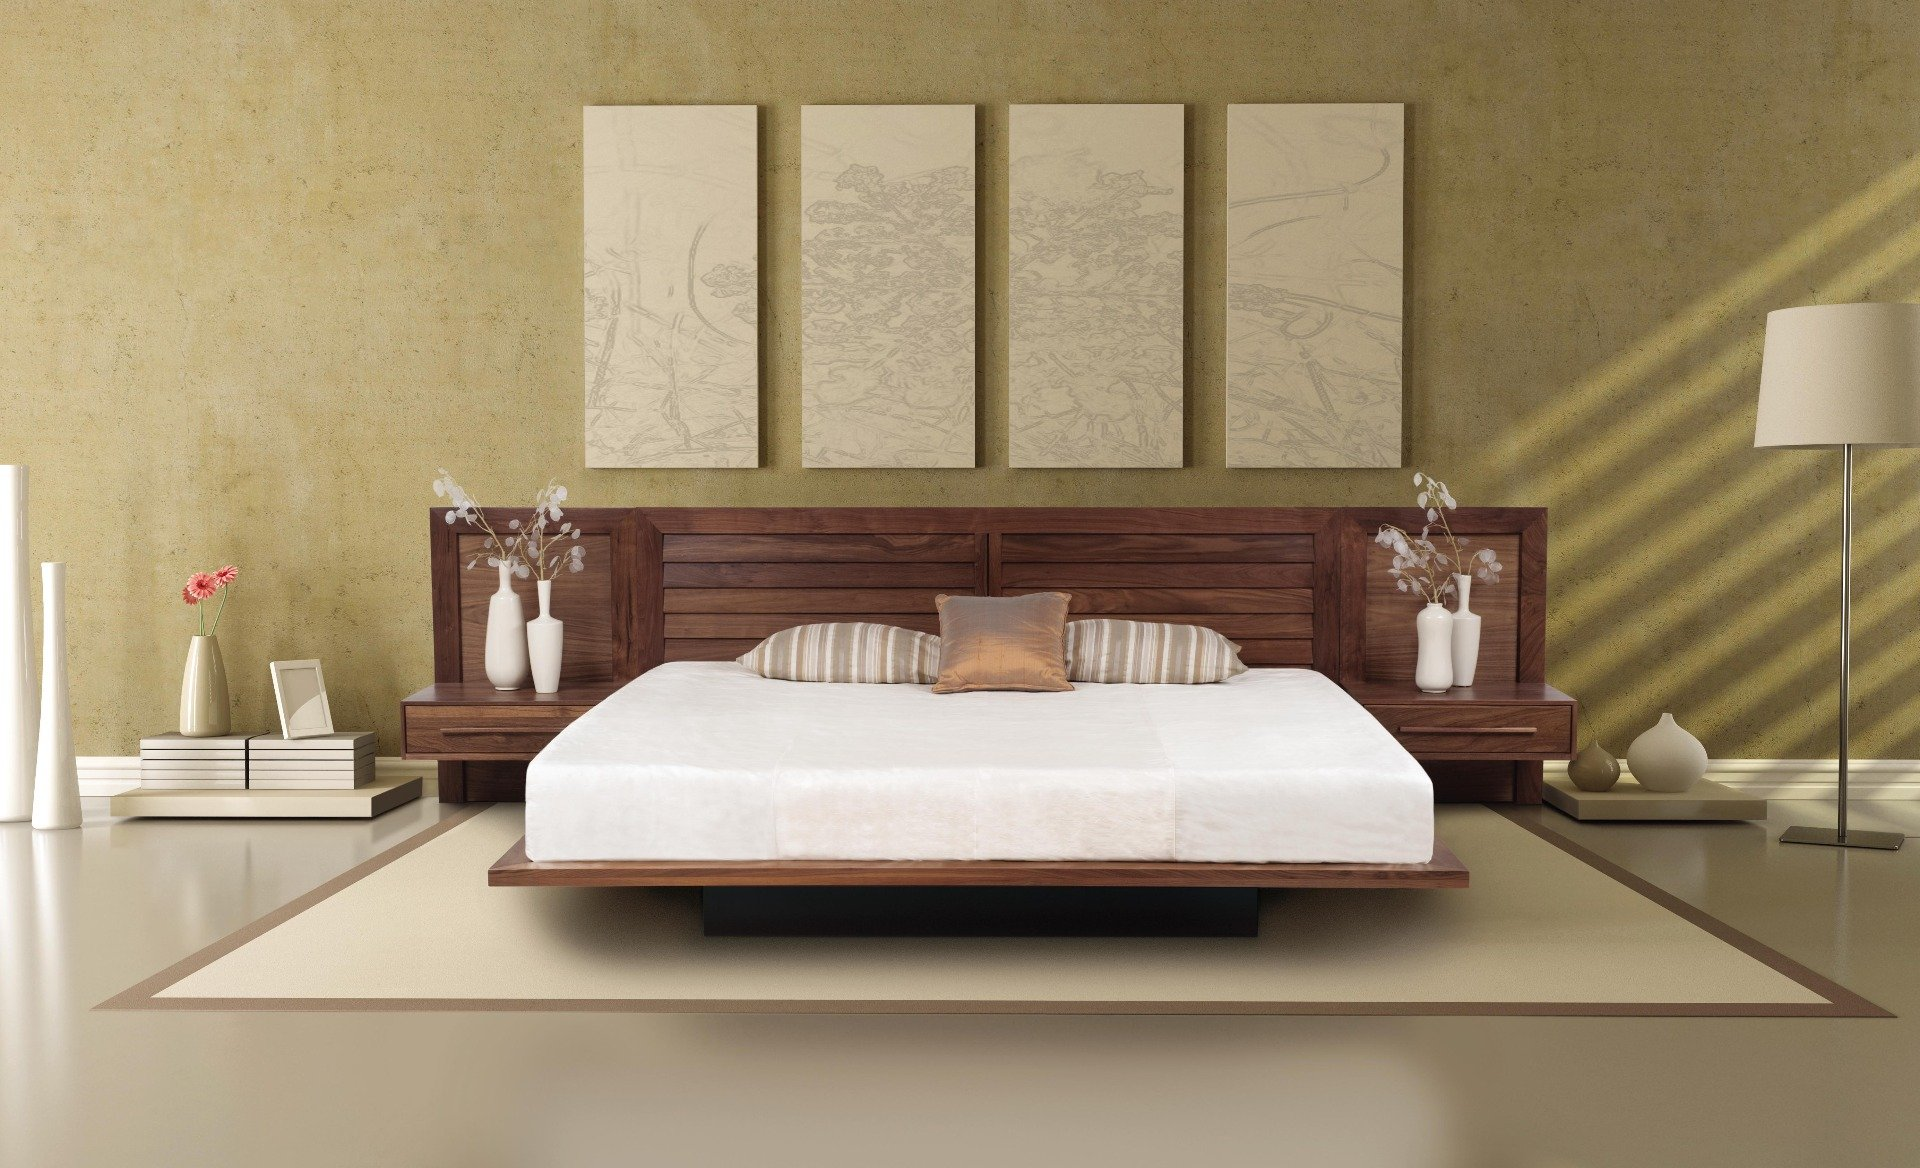 Moduluxe Modern Platform Bed With Clapboard Headboard Haiku Designs